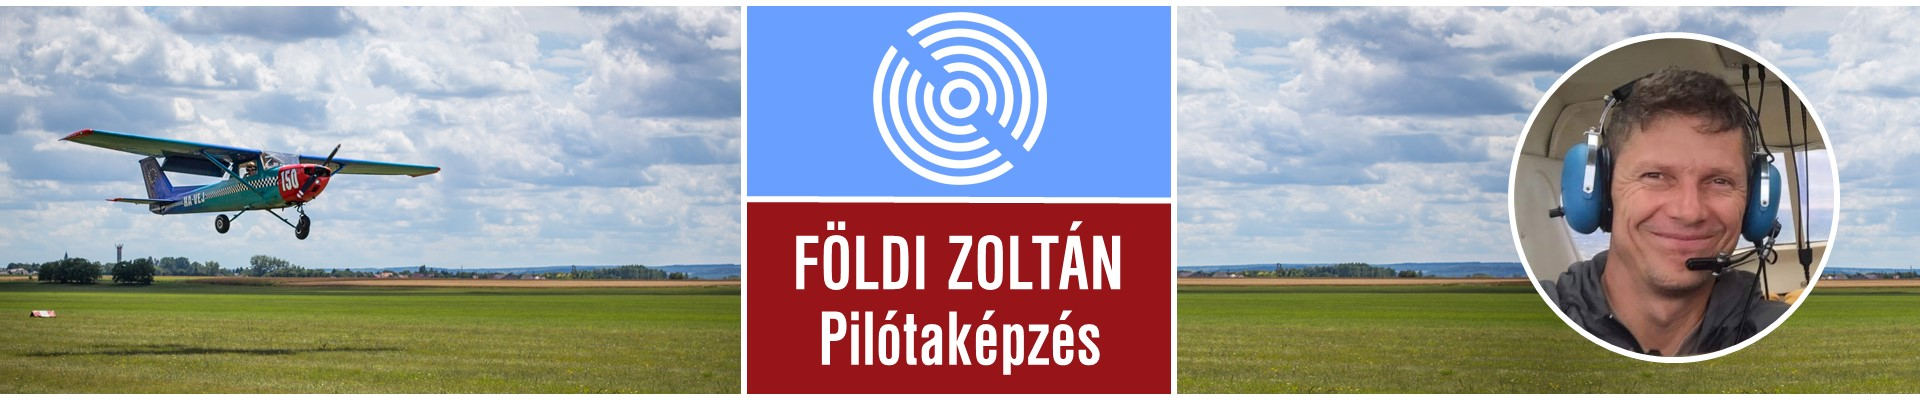 Földi Zoltán